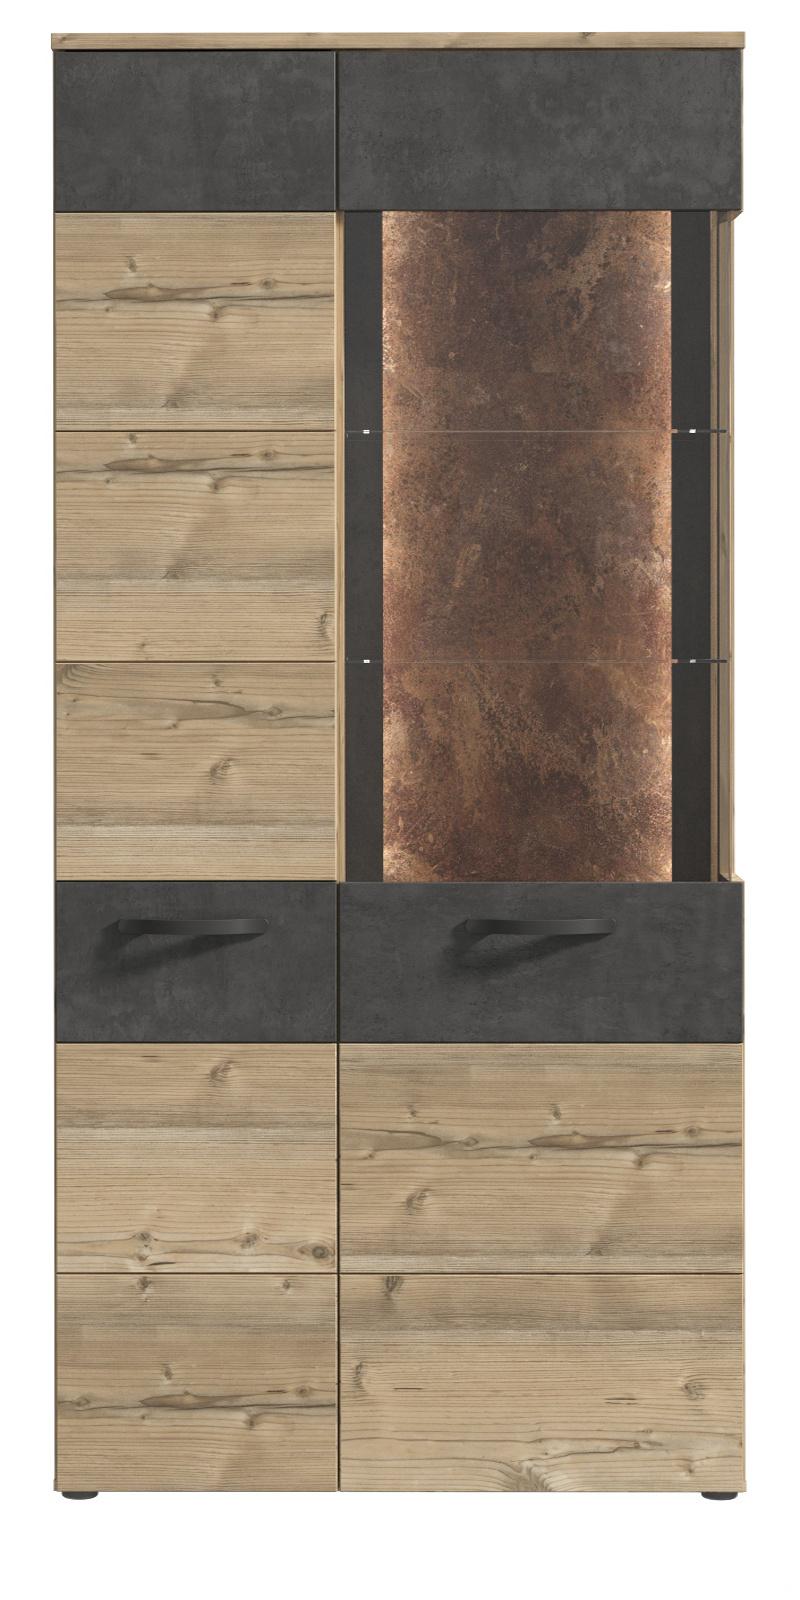 essgruppe tischgruppe wei hochglanz lack moda3 designerm bel moderne m bel owl. Black Bedroom Furniture Sets. Home Design Ideas